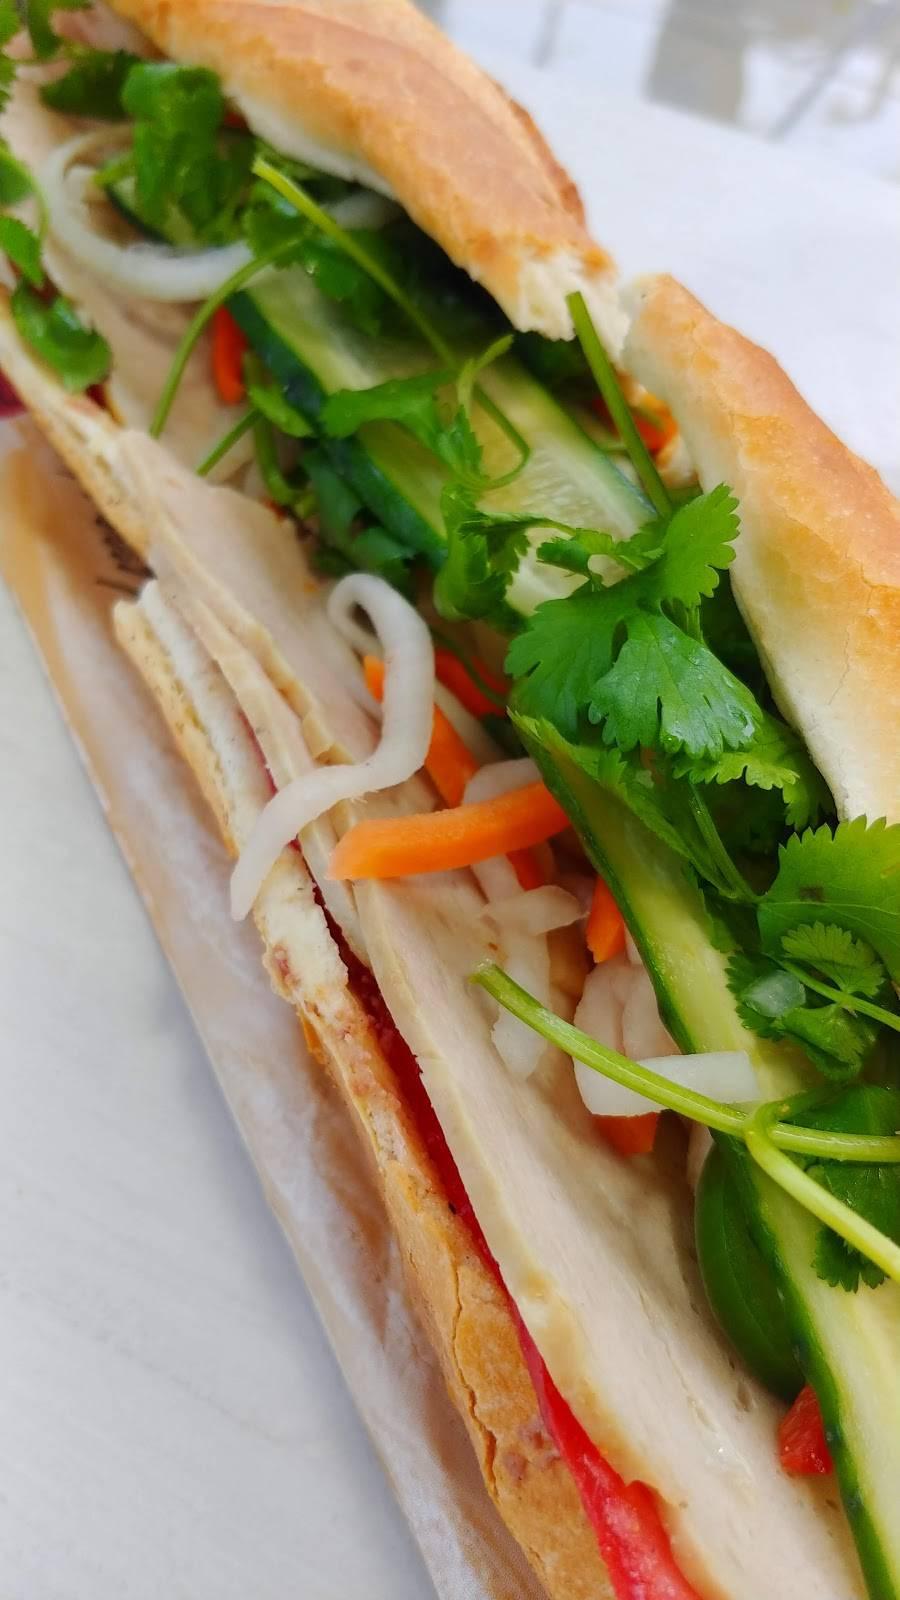 Pickle Banh Mi | restaurant | 12372 Brookhurst St, Garden Grove, CA 92840, USA | 7145377060 OR +1 714-537-7060